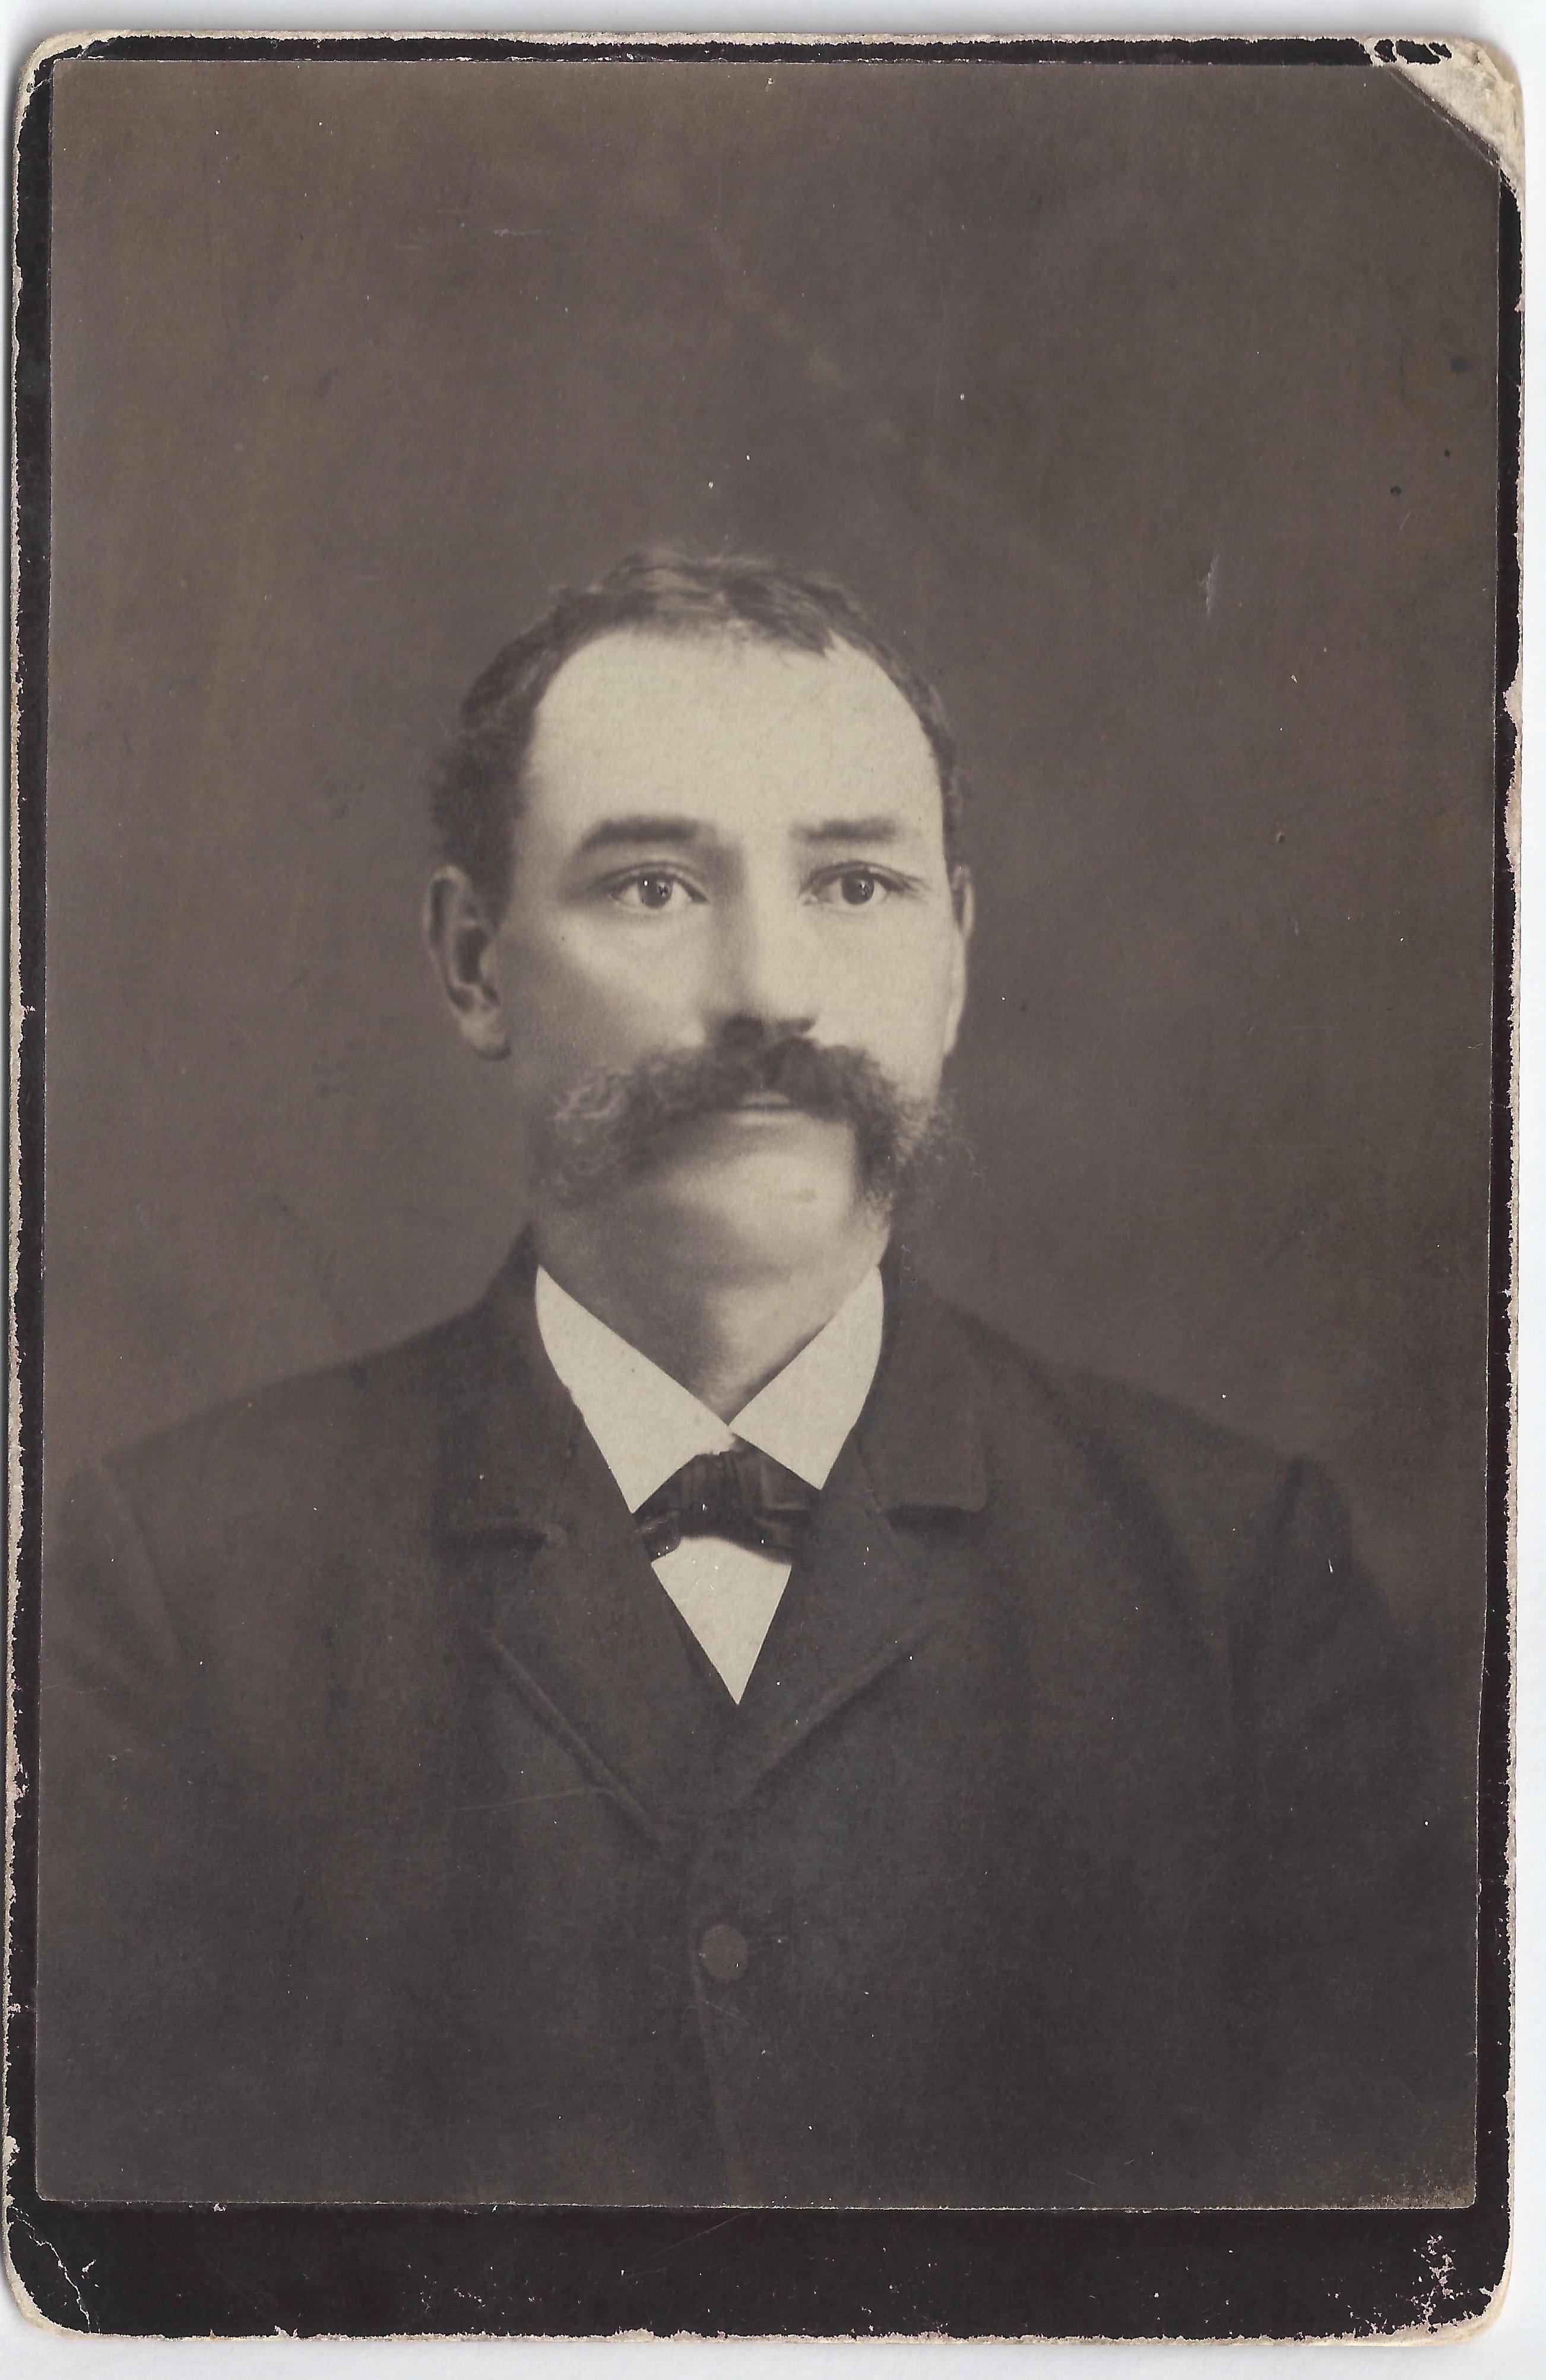 Jacob Lewis Weigel